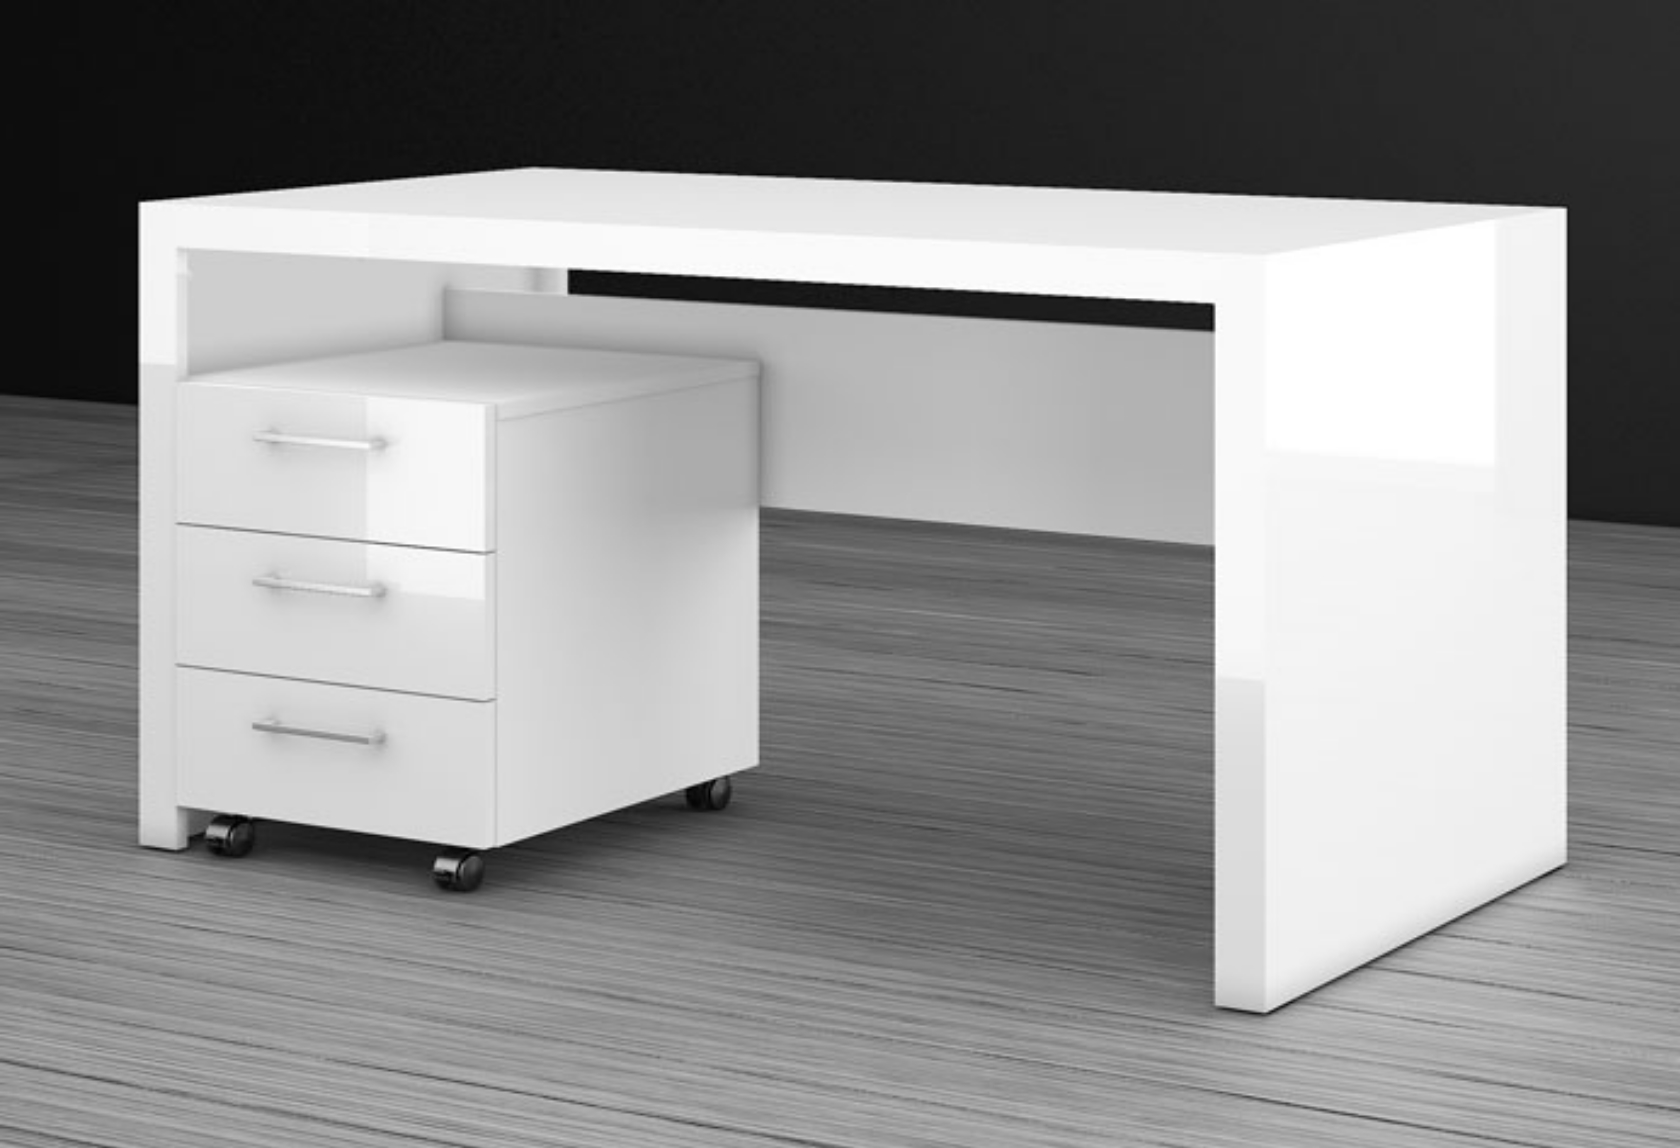 nowoczesne biurko biurko biurka meble biurowe rega�y